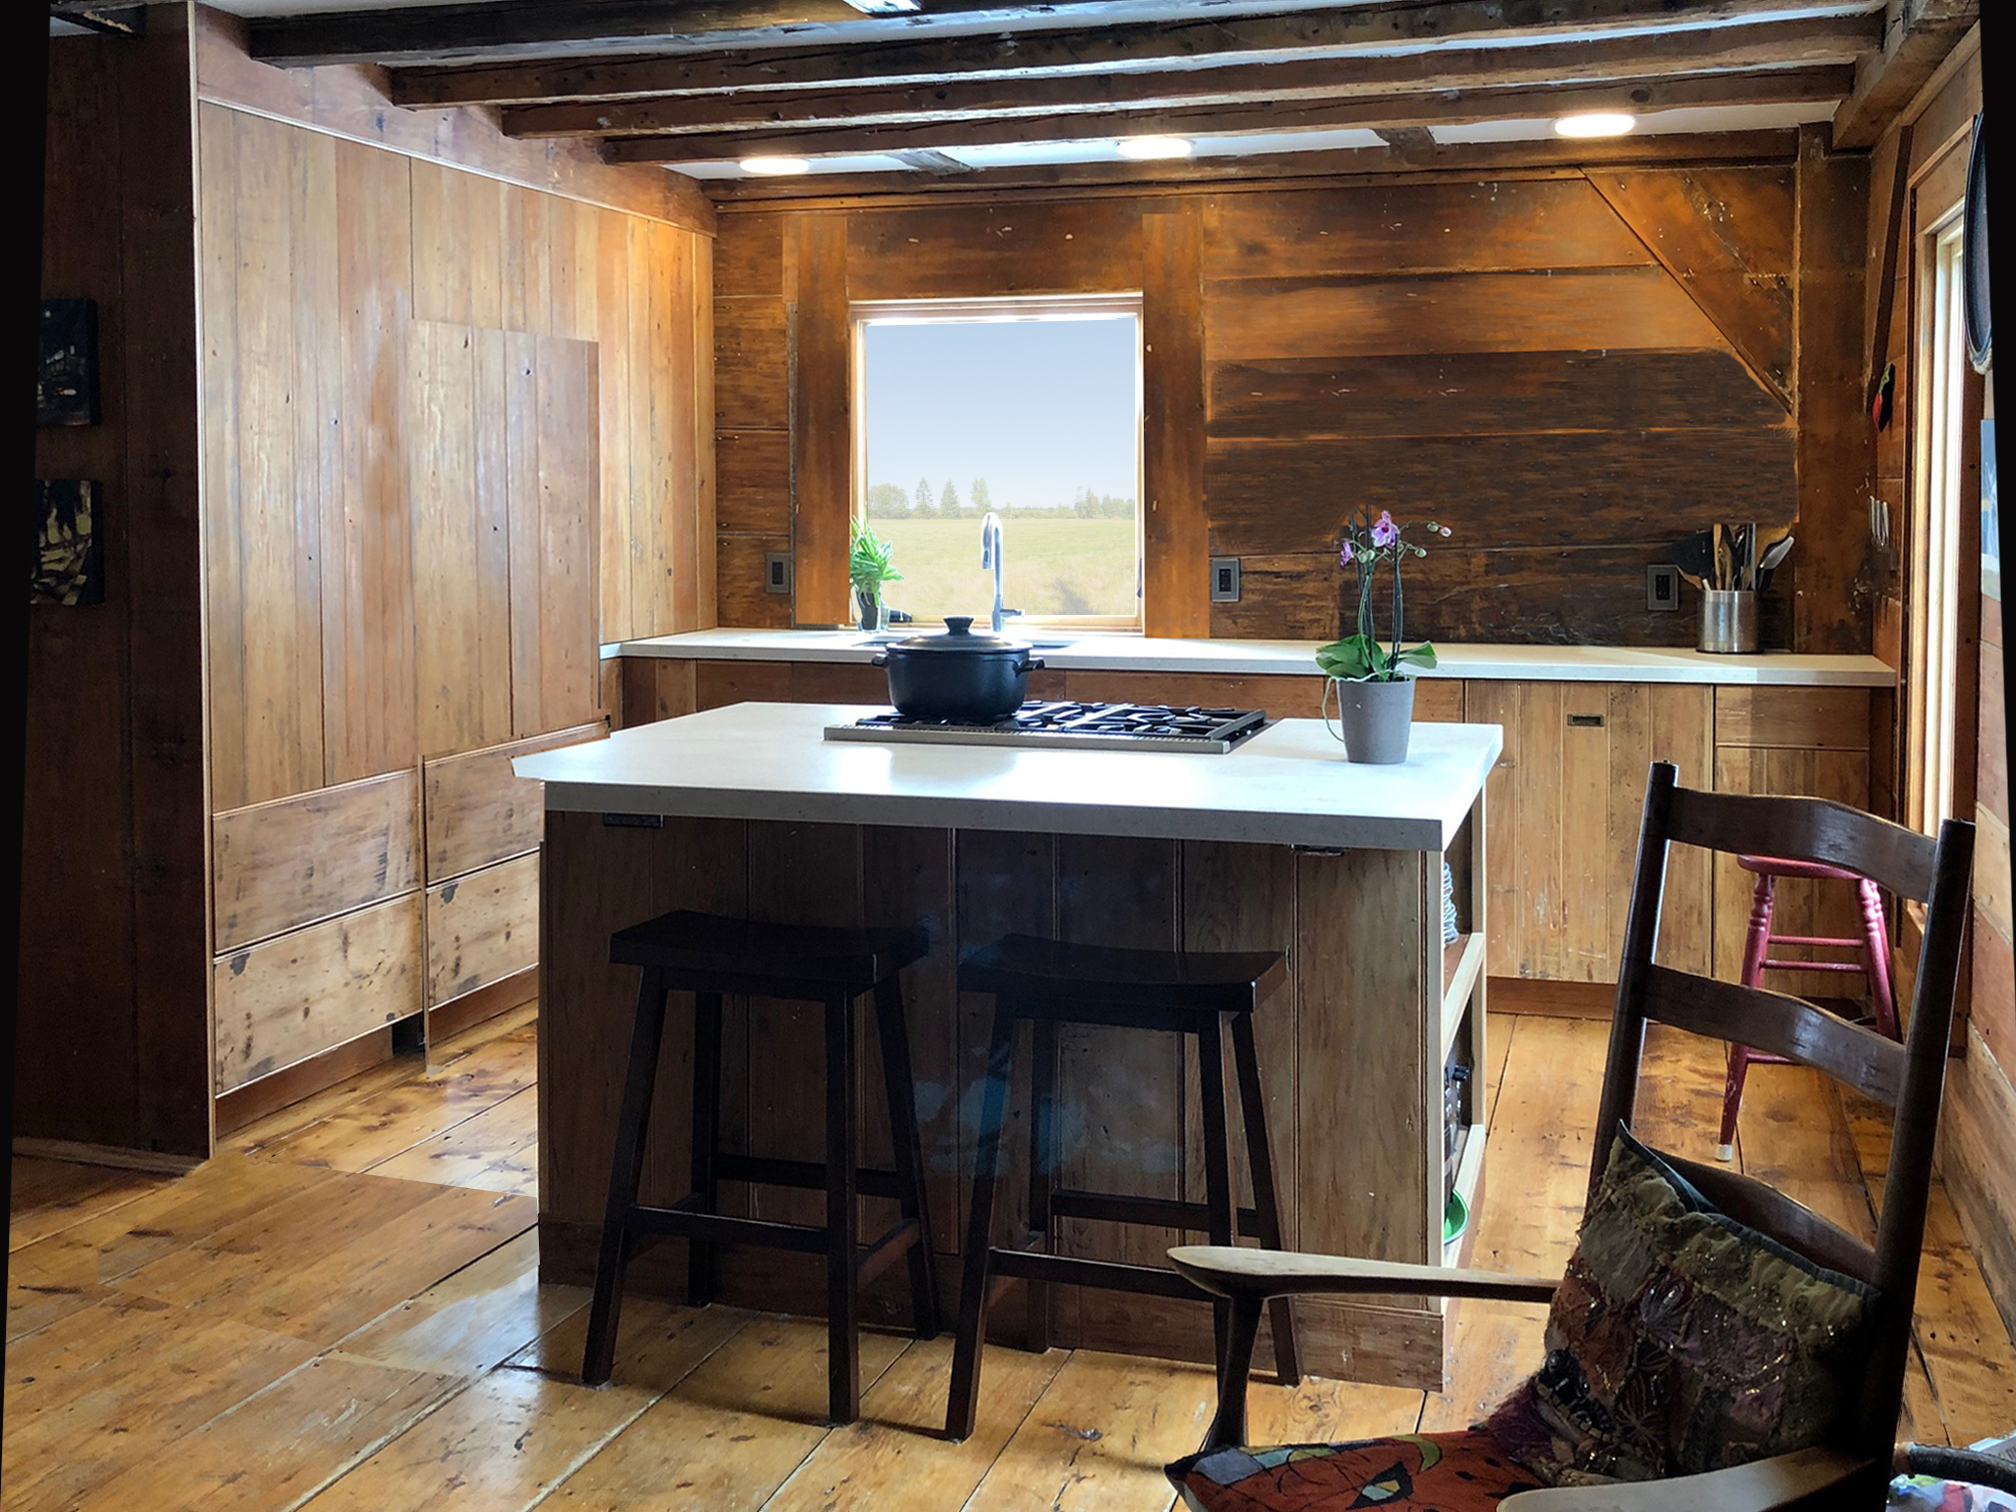 houdinidesign_ARCHITECTS_Mercer-Gordon_Residence_Port_Williams_Annapolis_Valley_Acadian+Kitchen_Renovation_Historical_02.jpg